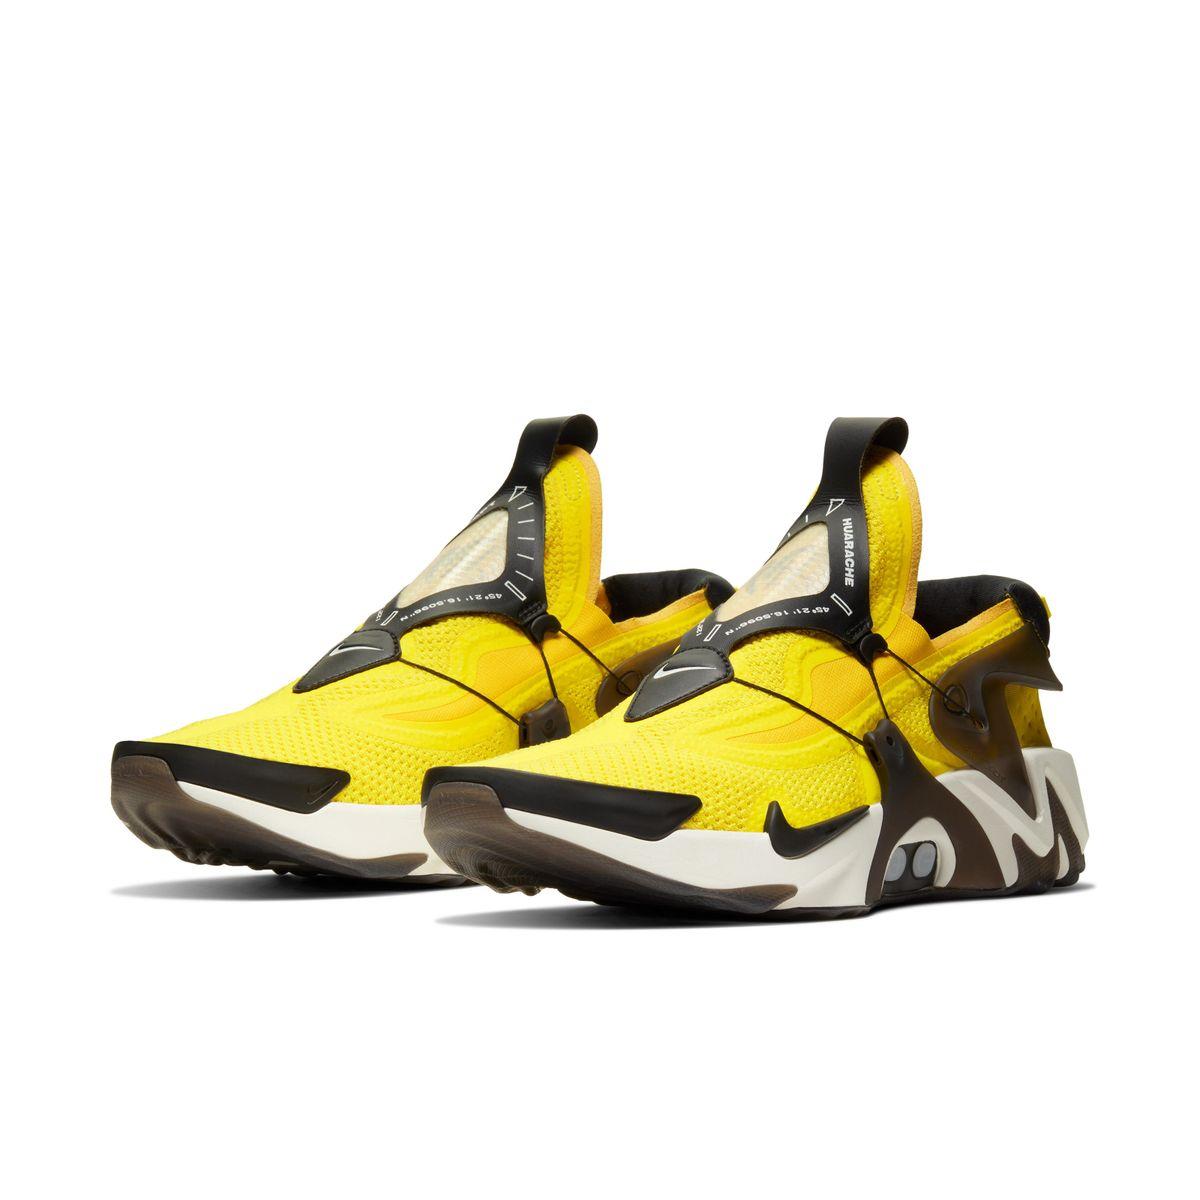 Nike — Adapt Huarache Yellow - Image 2